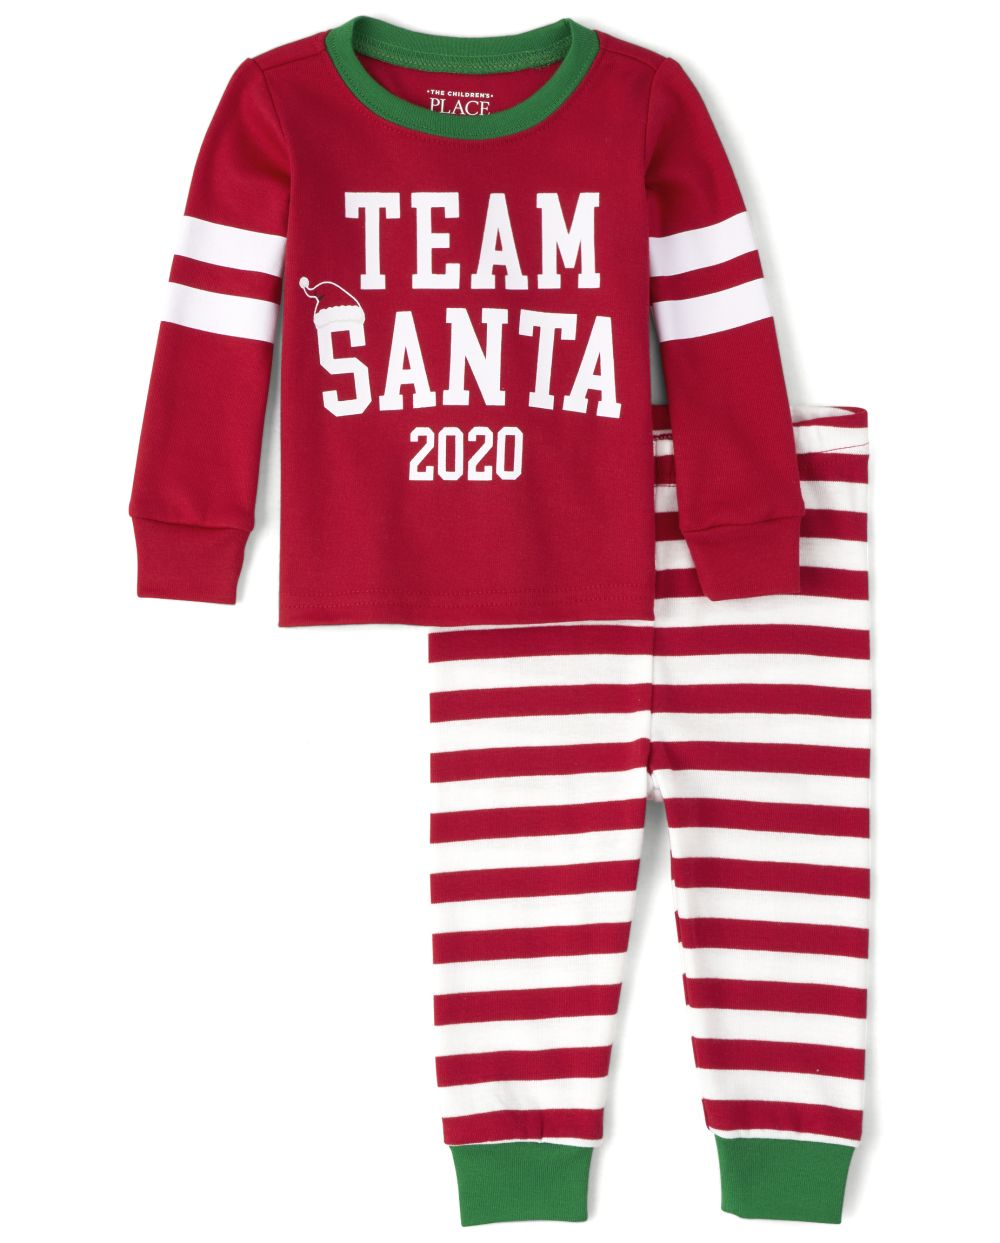 Unisex Baby And Toddler Matching Family Team Santa Snug Fit Cotton Pajamas